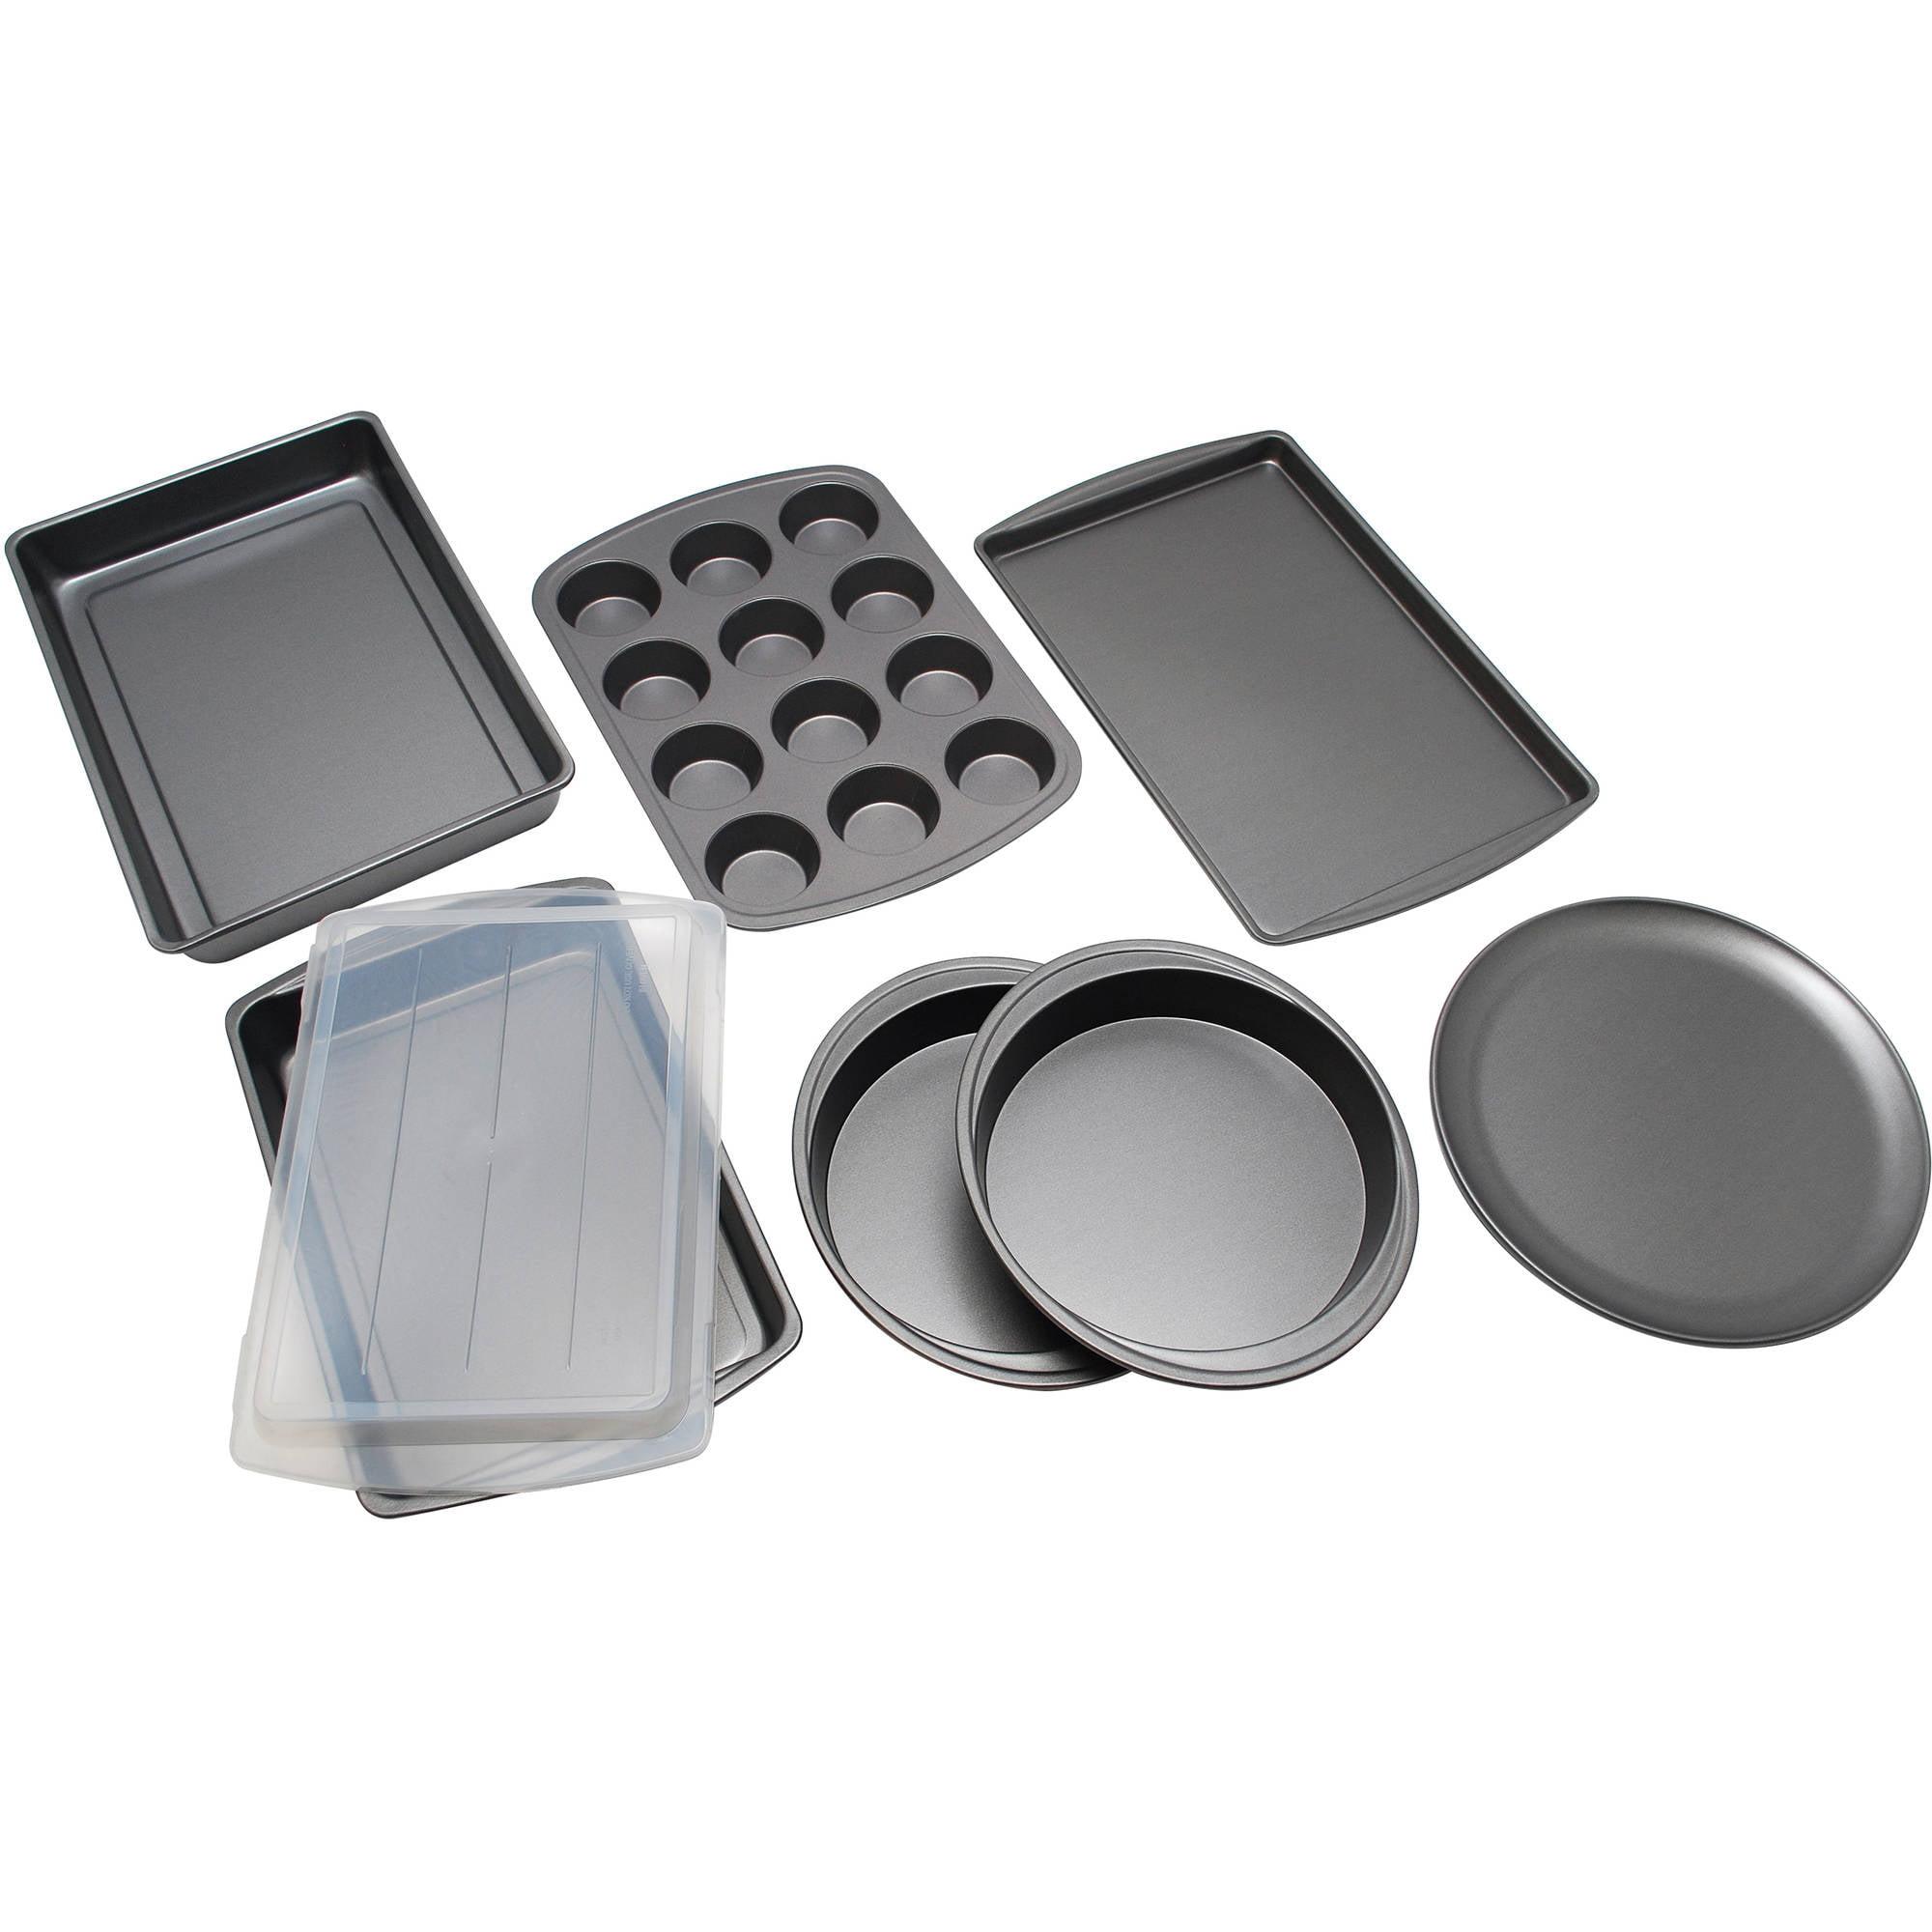 Mainstays 8-Piece Bakeware Basics Set, Grey